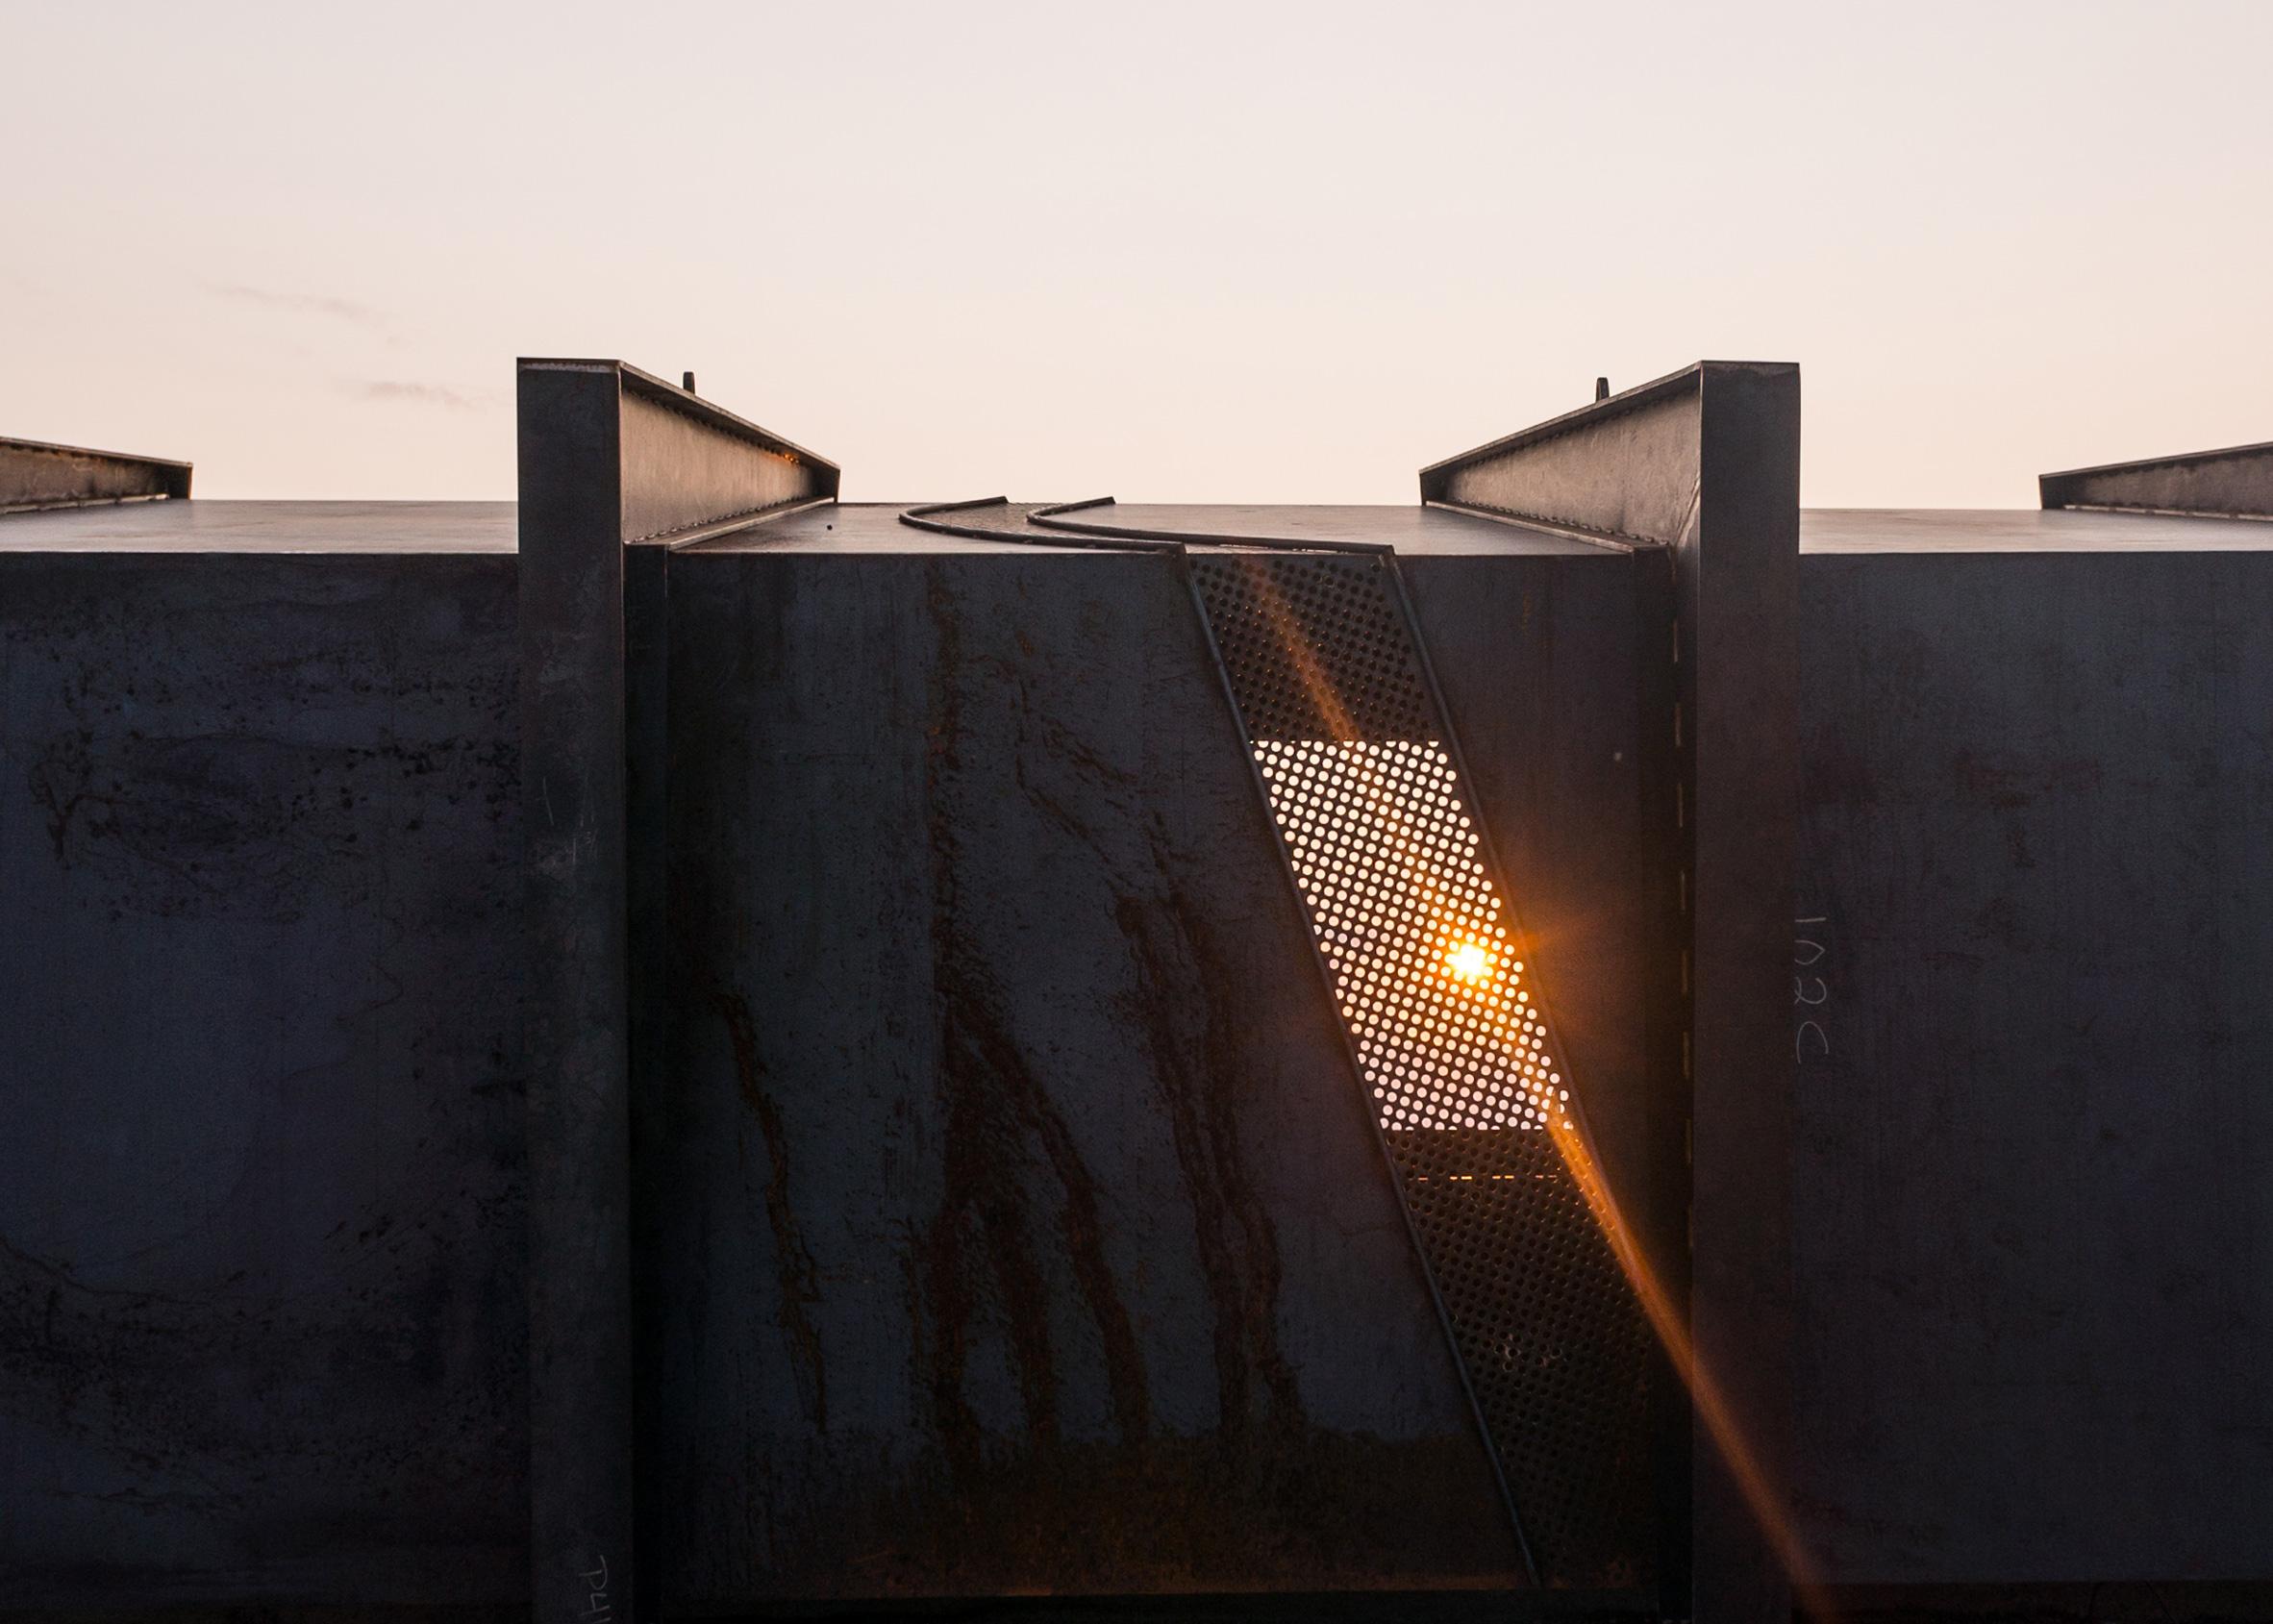 Sunset Pavilion, Firestone, Colorado, by Tomecek Studio Architecture